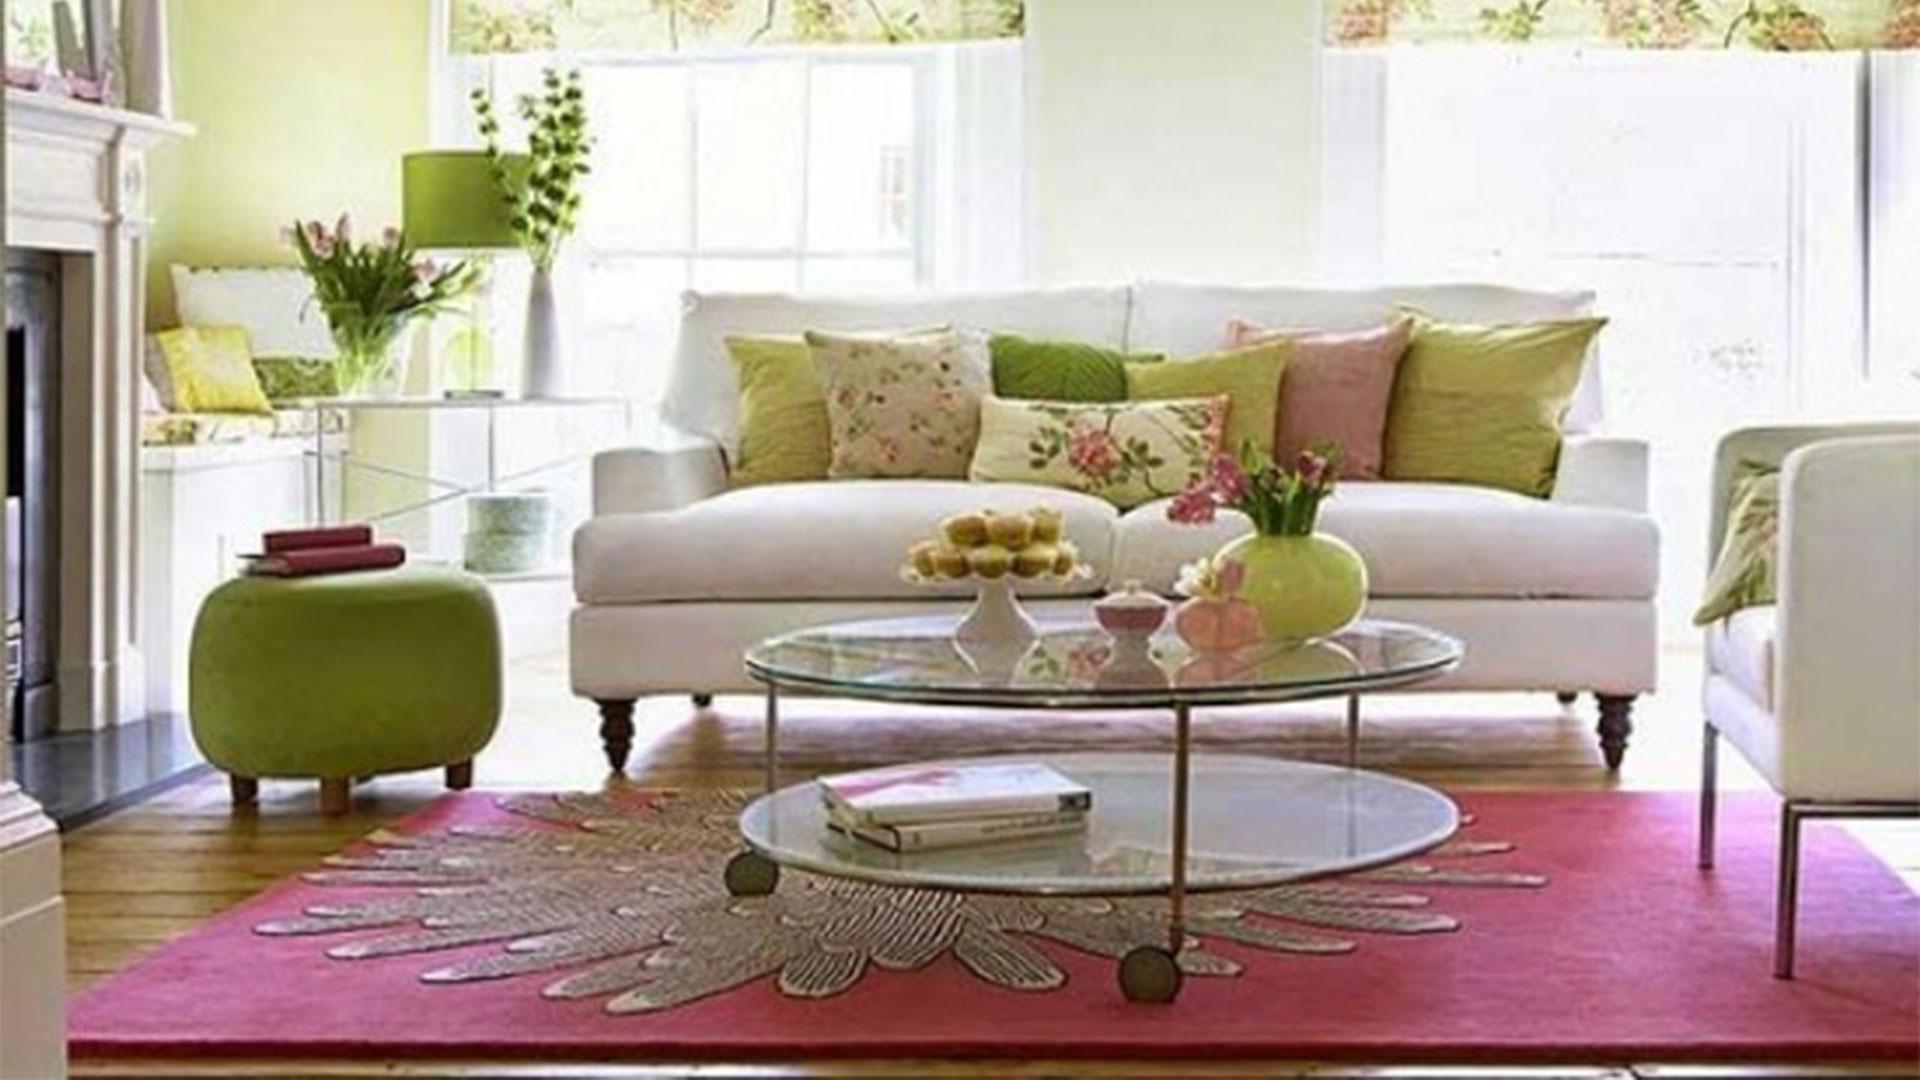 living room designs ideas photo - 9